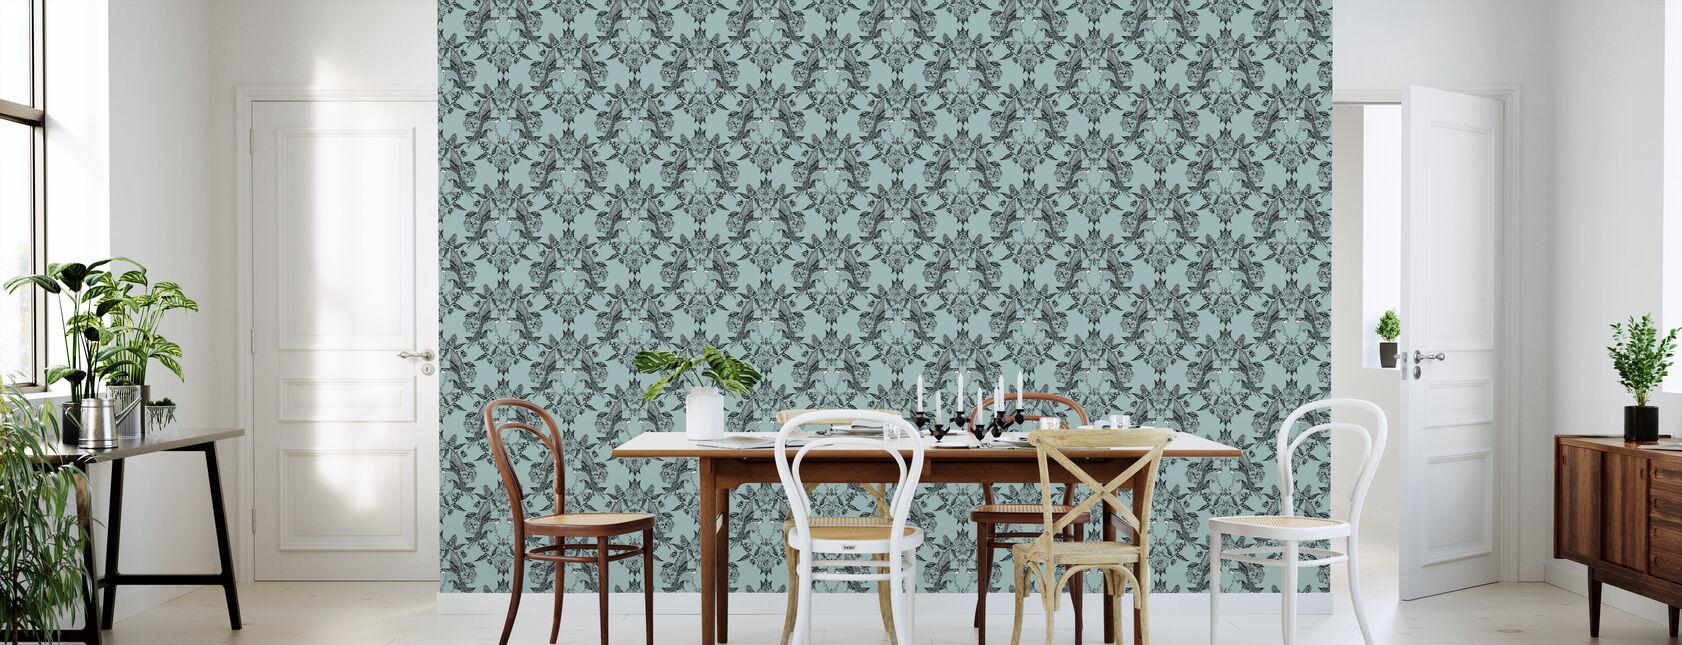 Budgies Medallion Turquoise - Wallpaper - Kitchen